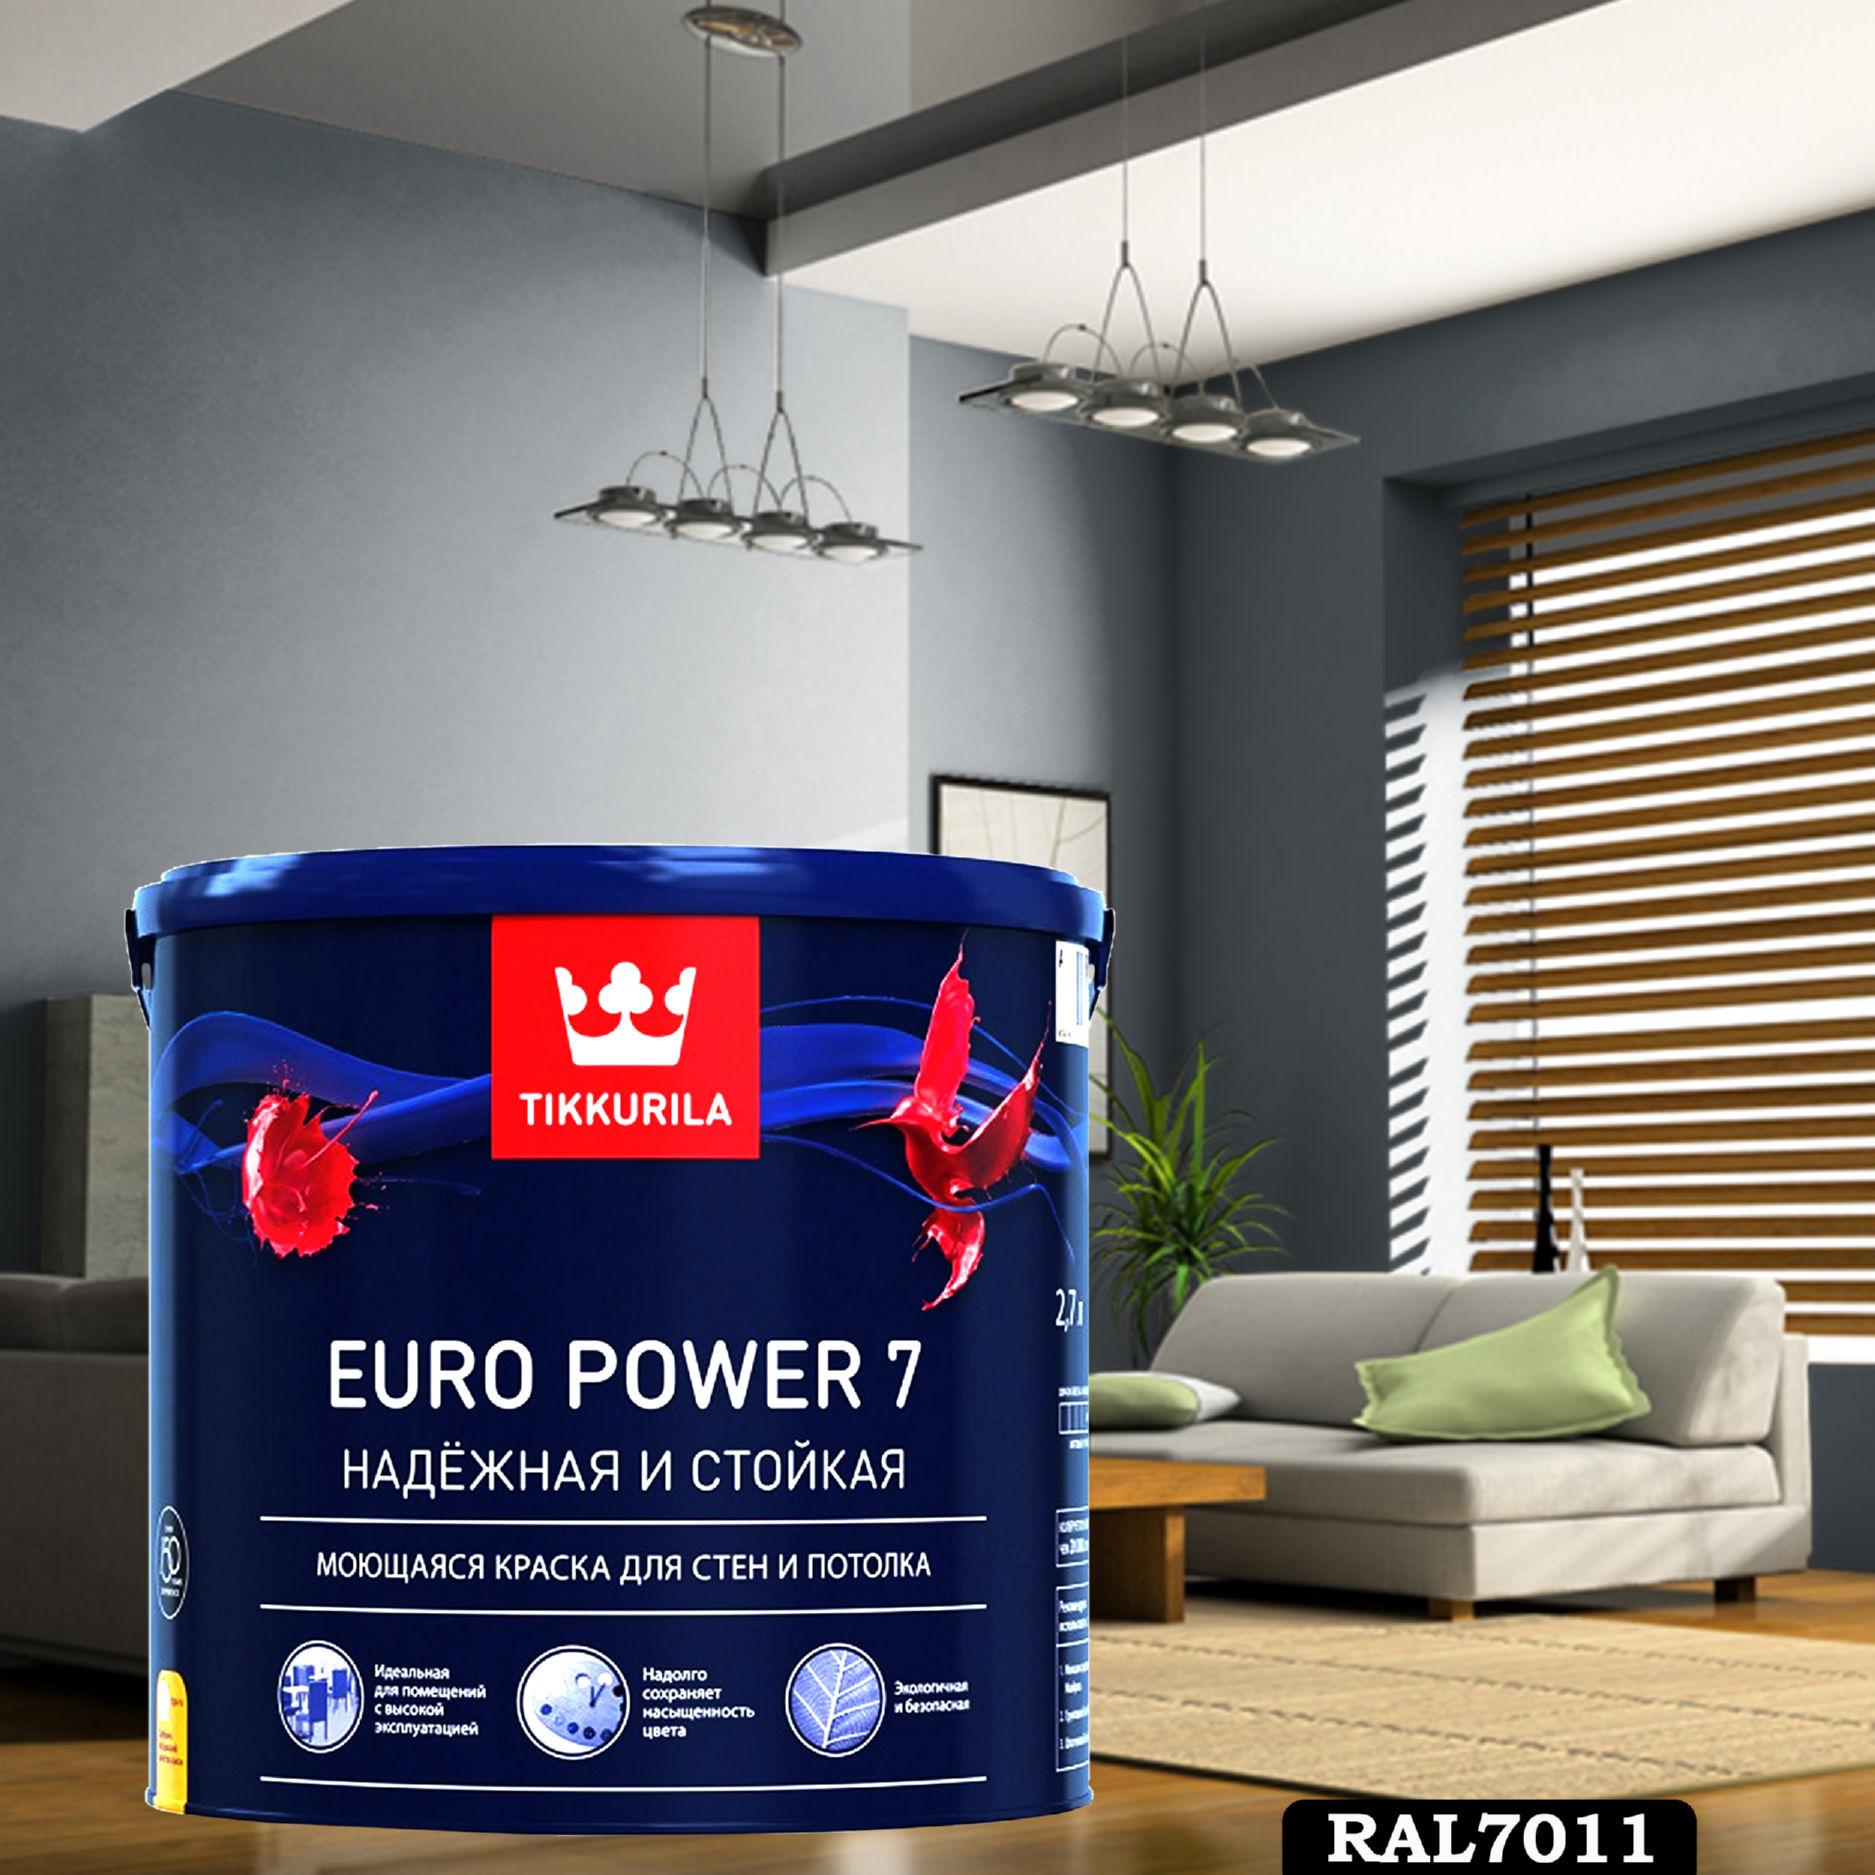 Фото 11 - Краска TIKKURILA Euro Power 7,  RAL 7011 Серый-металл, латексная моющаяся матовая интерьерная, 9 л.